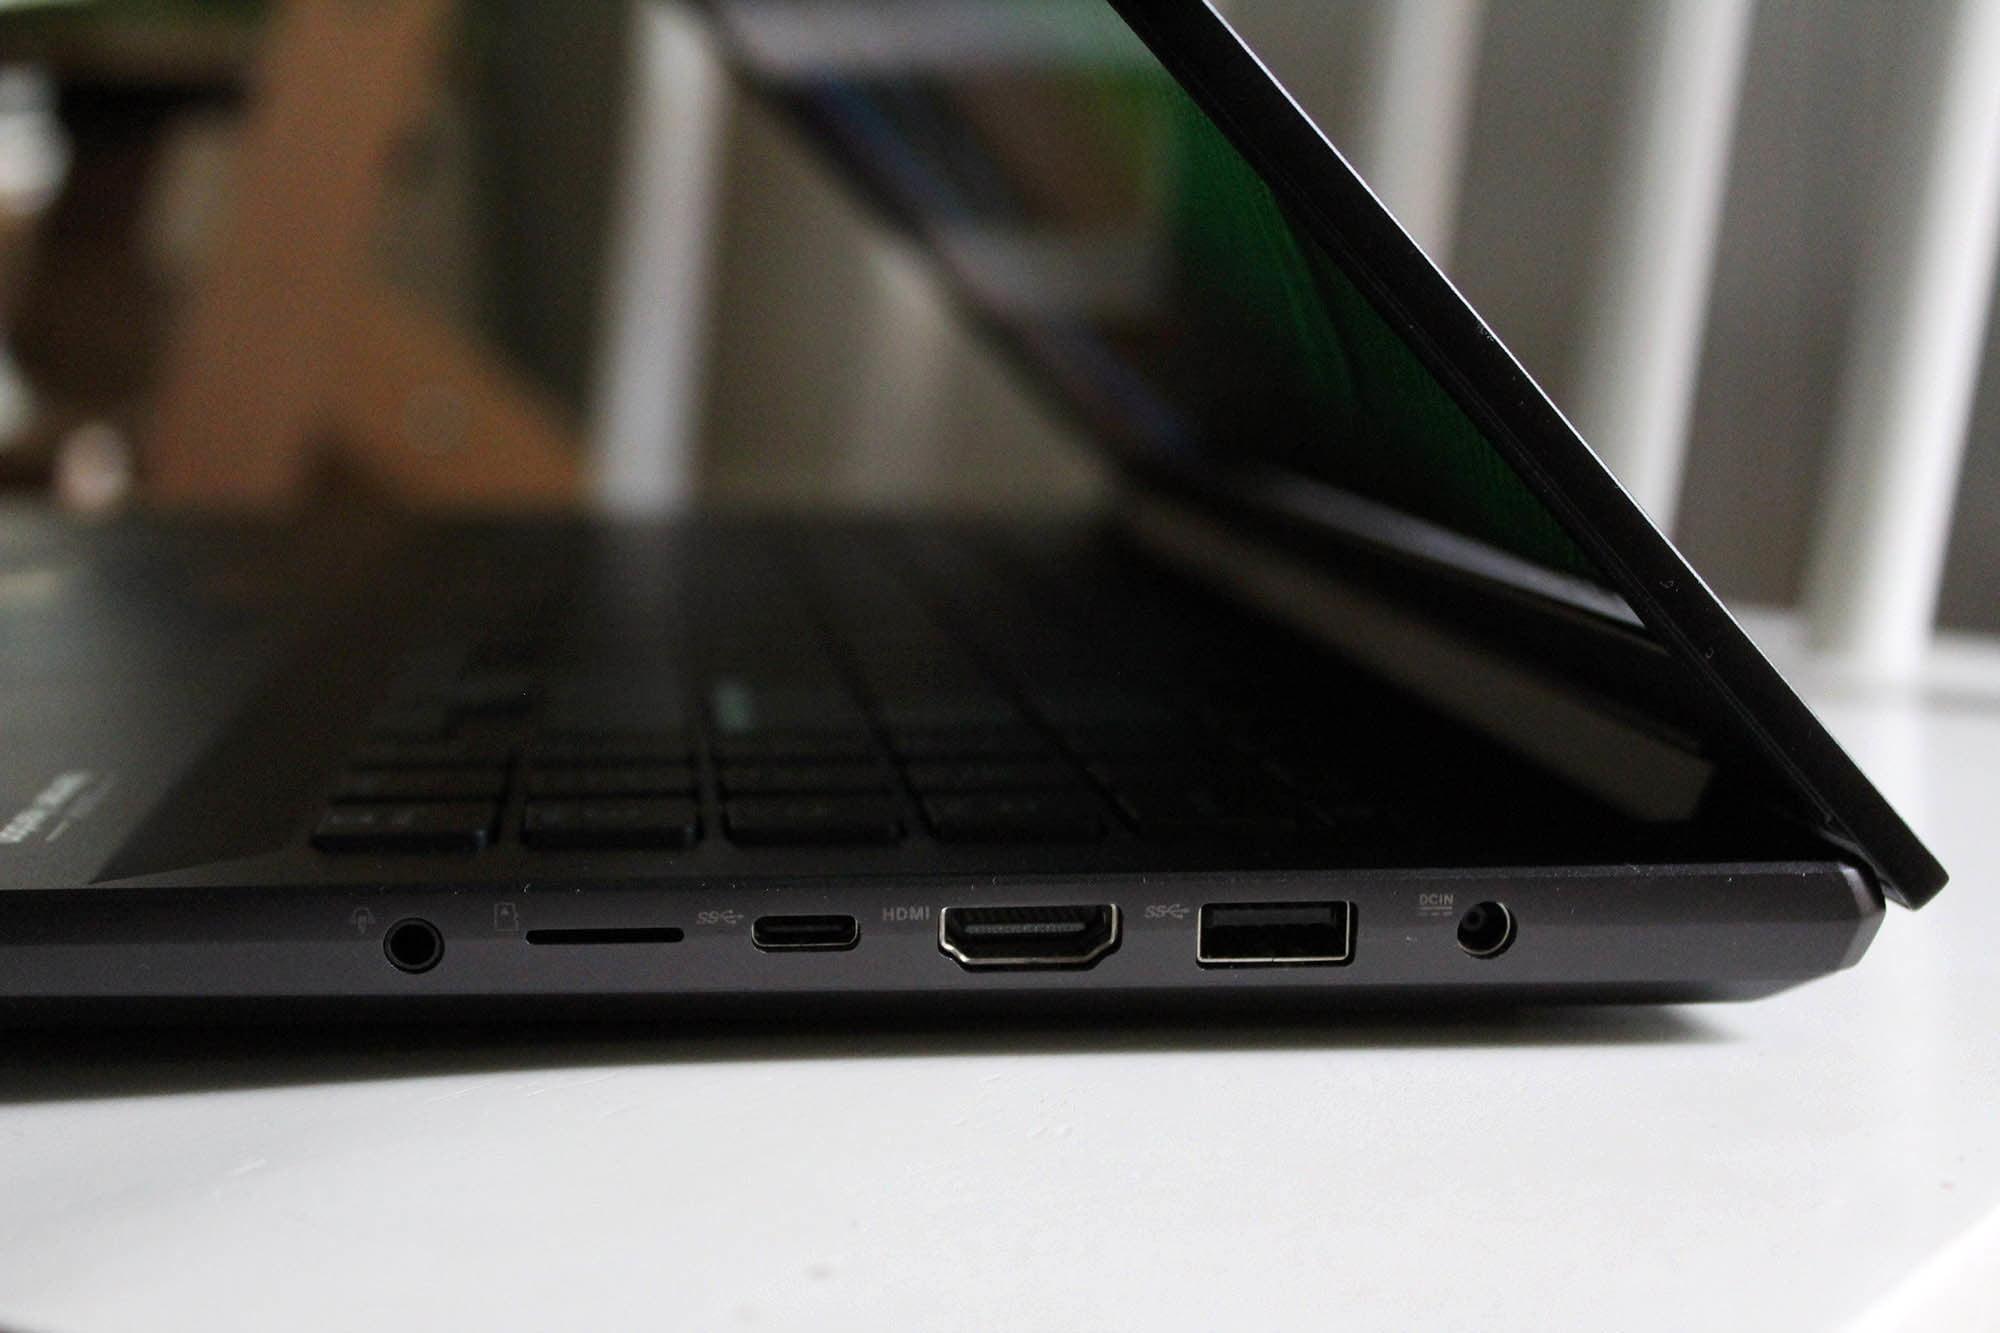 Right side connectivity on the Asus Vivobook Pro 16X OLED laptop. Headphone jack, micro SD slot, micro USB port, HDMI port, USB